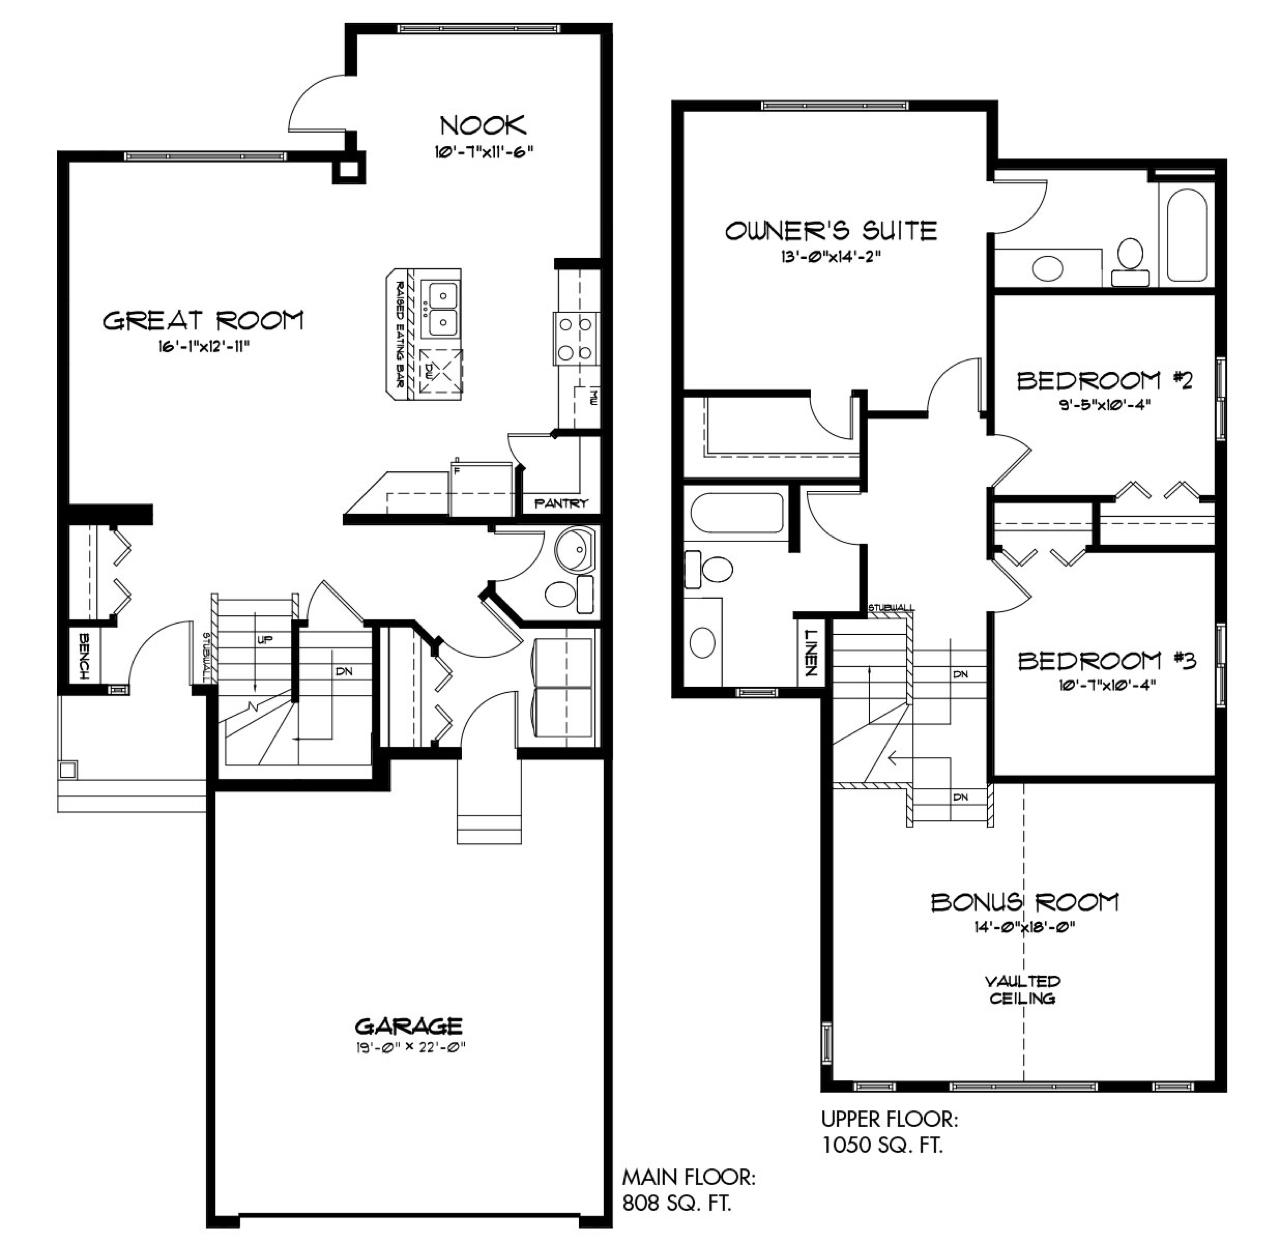 3 Ravishing New Quick Possession Homes Estonian Floorplan image